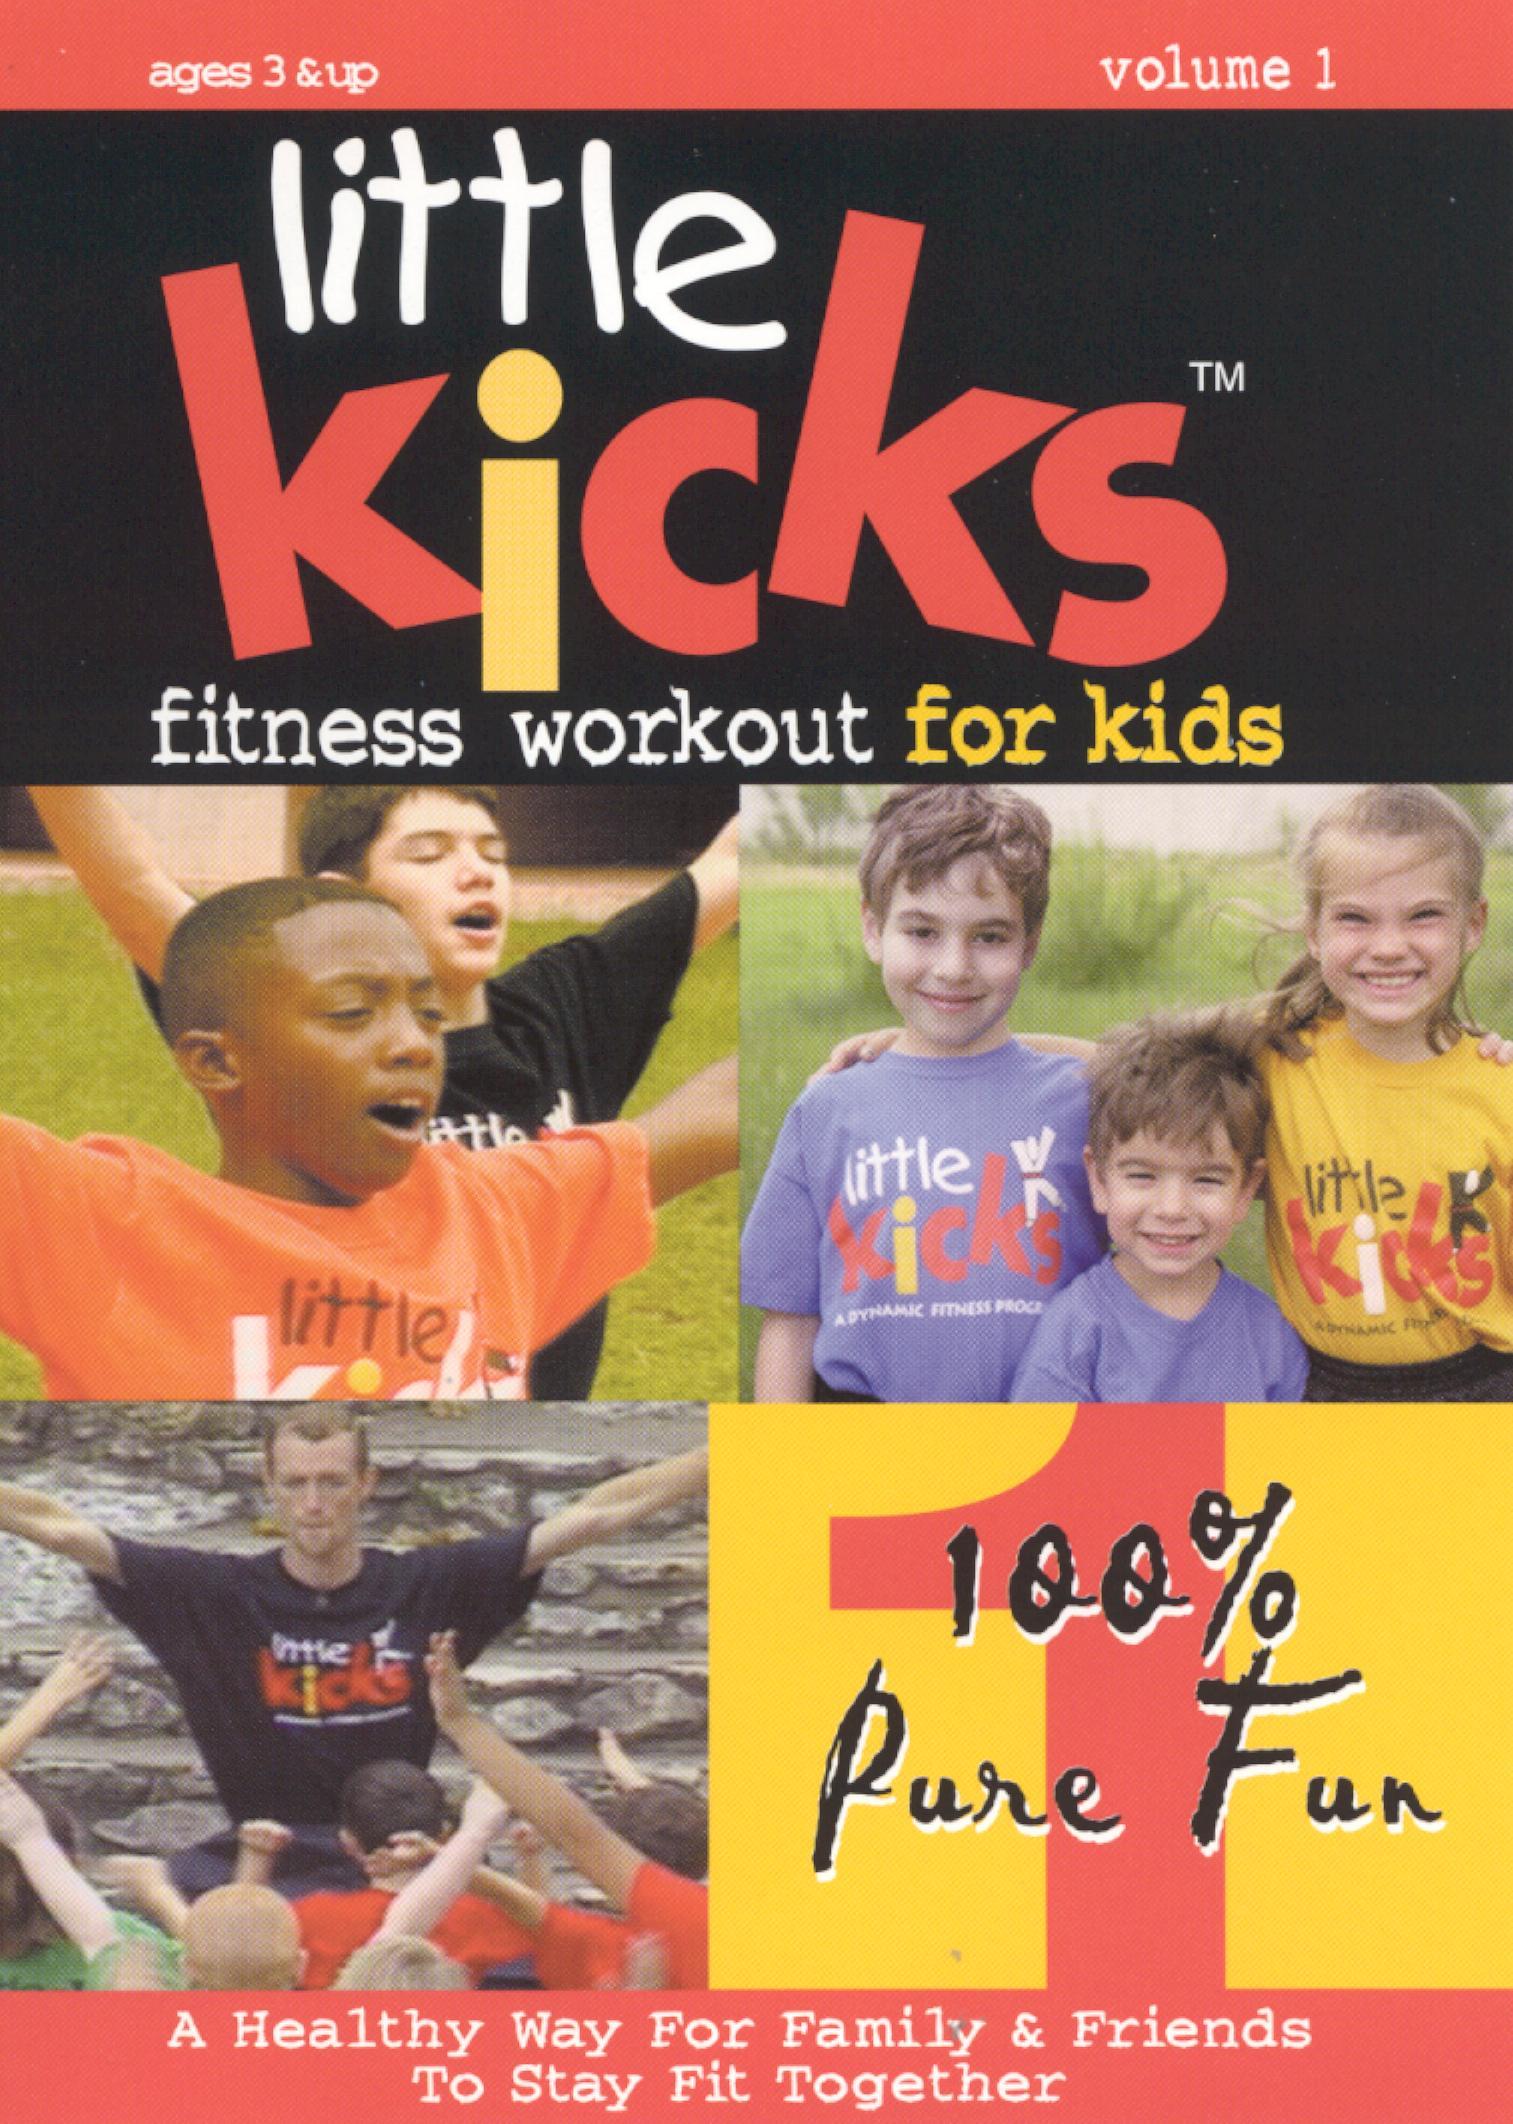 Little Kicks: Fitness Workout for Kids, Vol. 1 - 100% Pure Fun